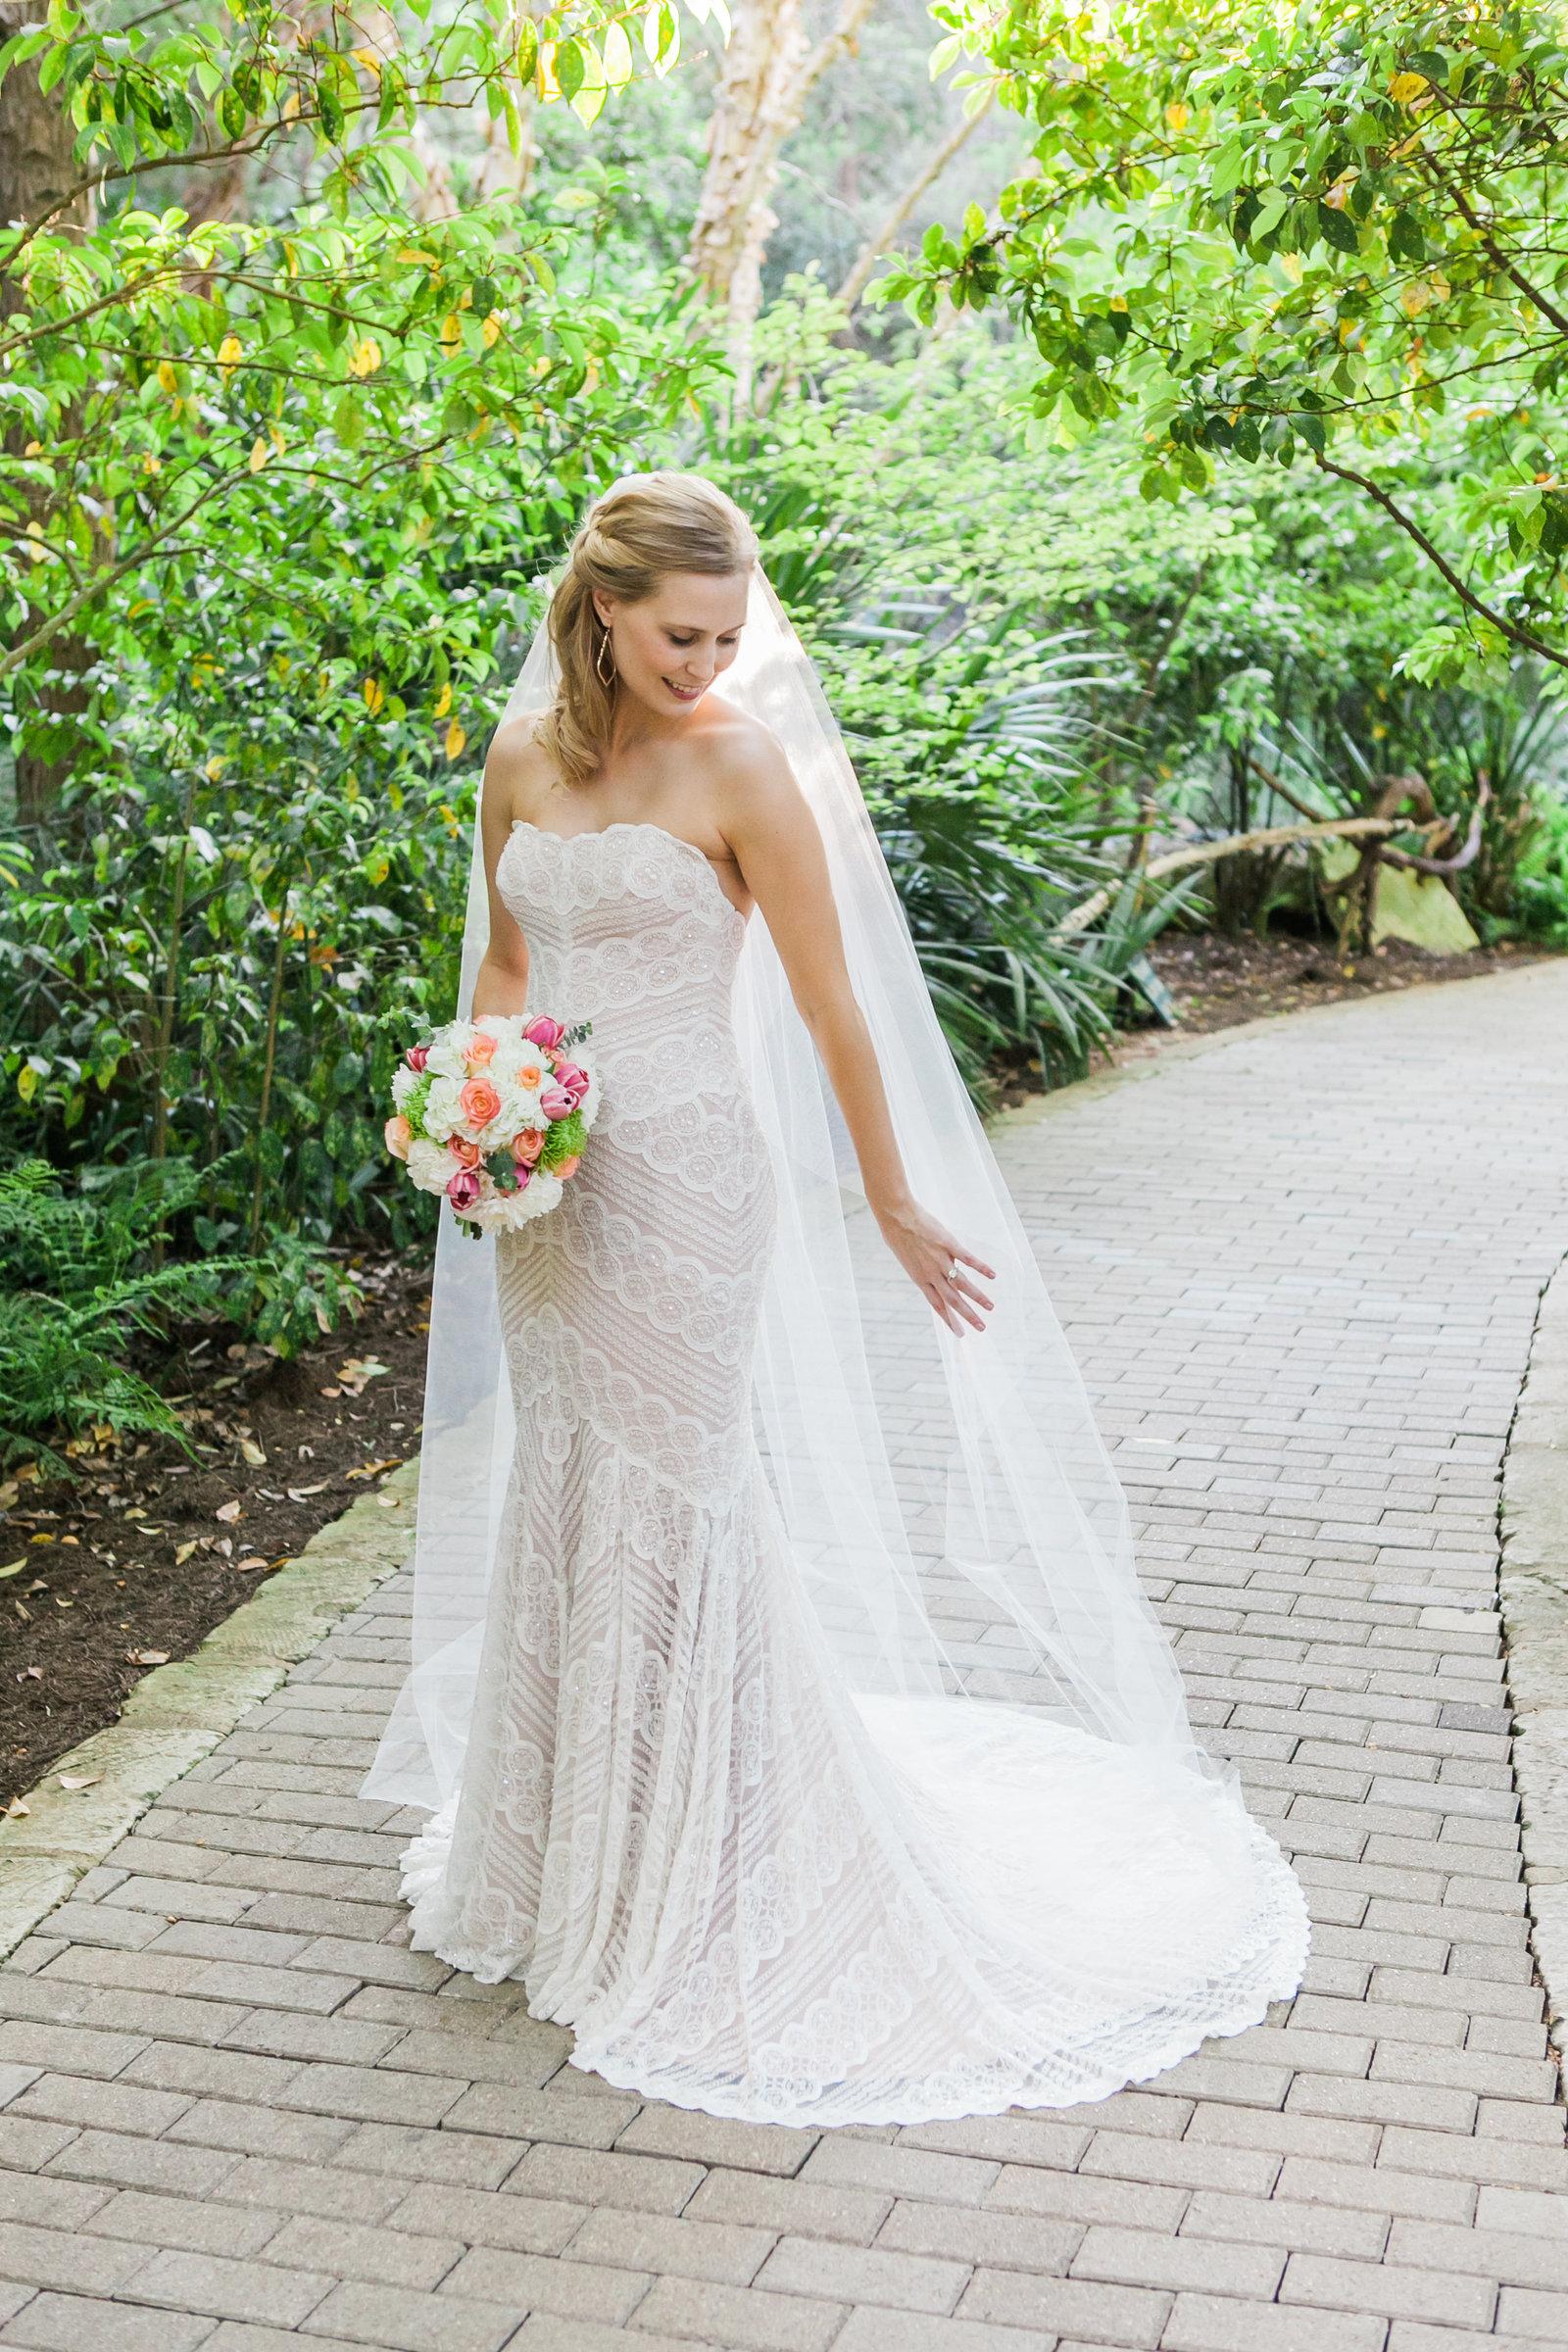 Austin Family Photographer, Tiffany Chapman, bride looking at veil